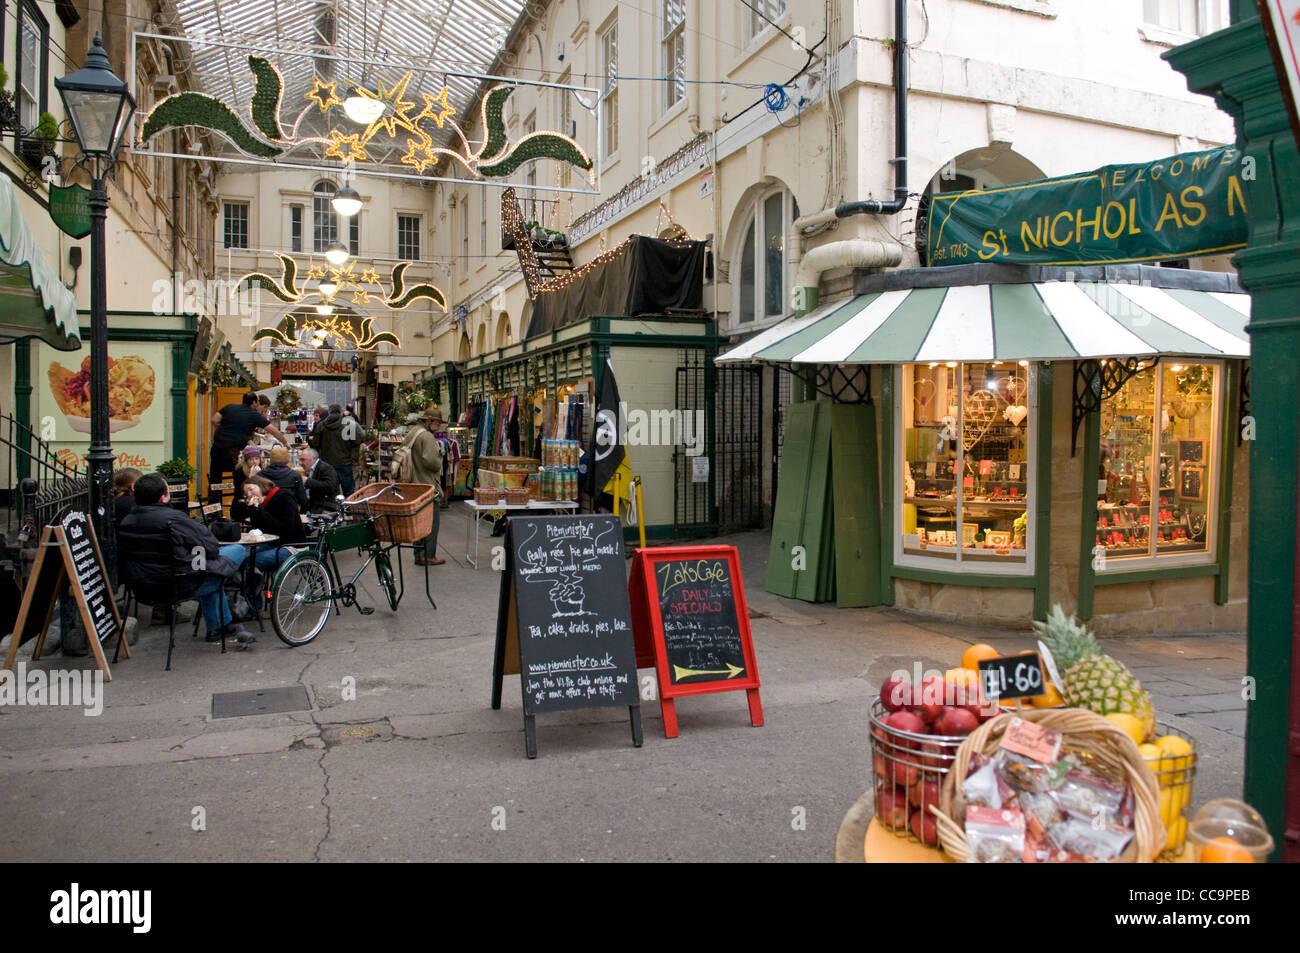 St Nicholas Market ,Bristol, UK - Stock Image